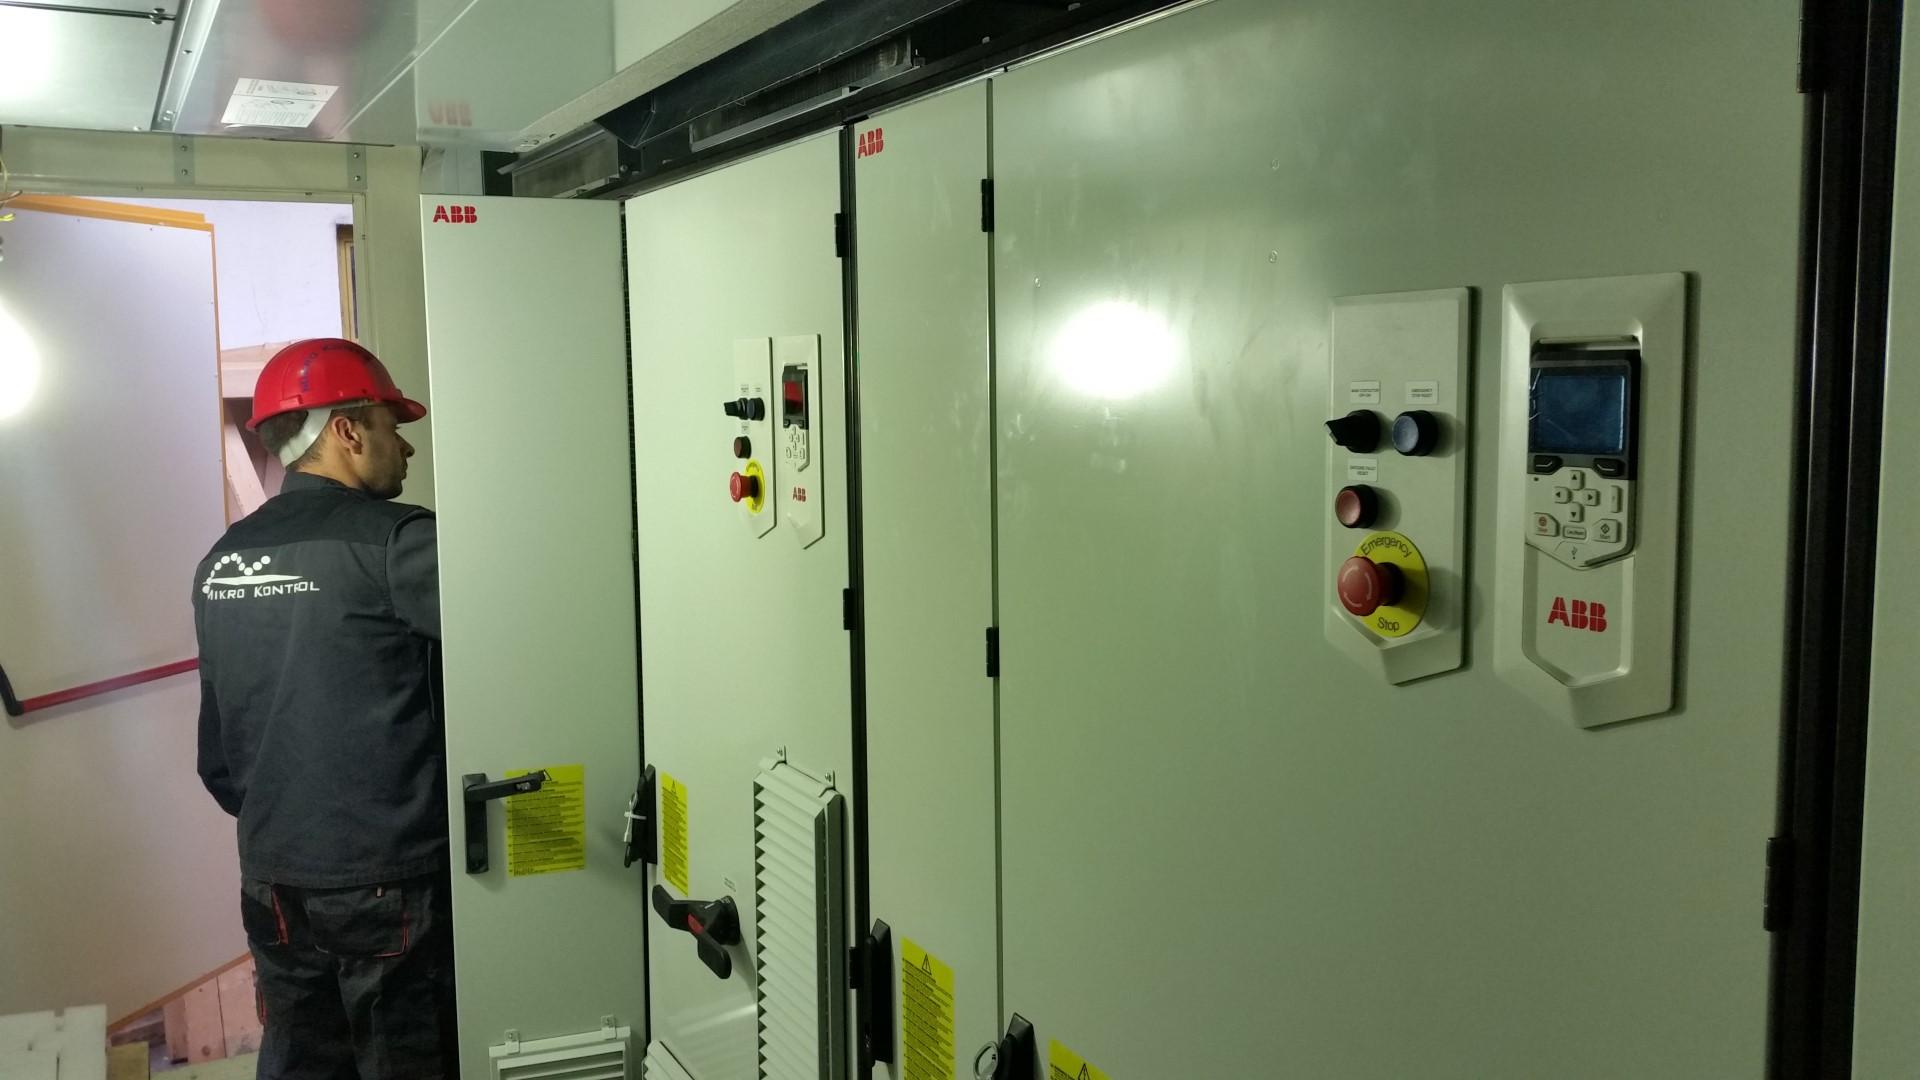 abb rb kolubara stanica frekventni regulatori mikro kontrol automatizacija robotika automatika.rs